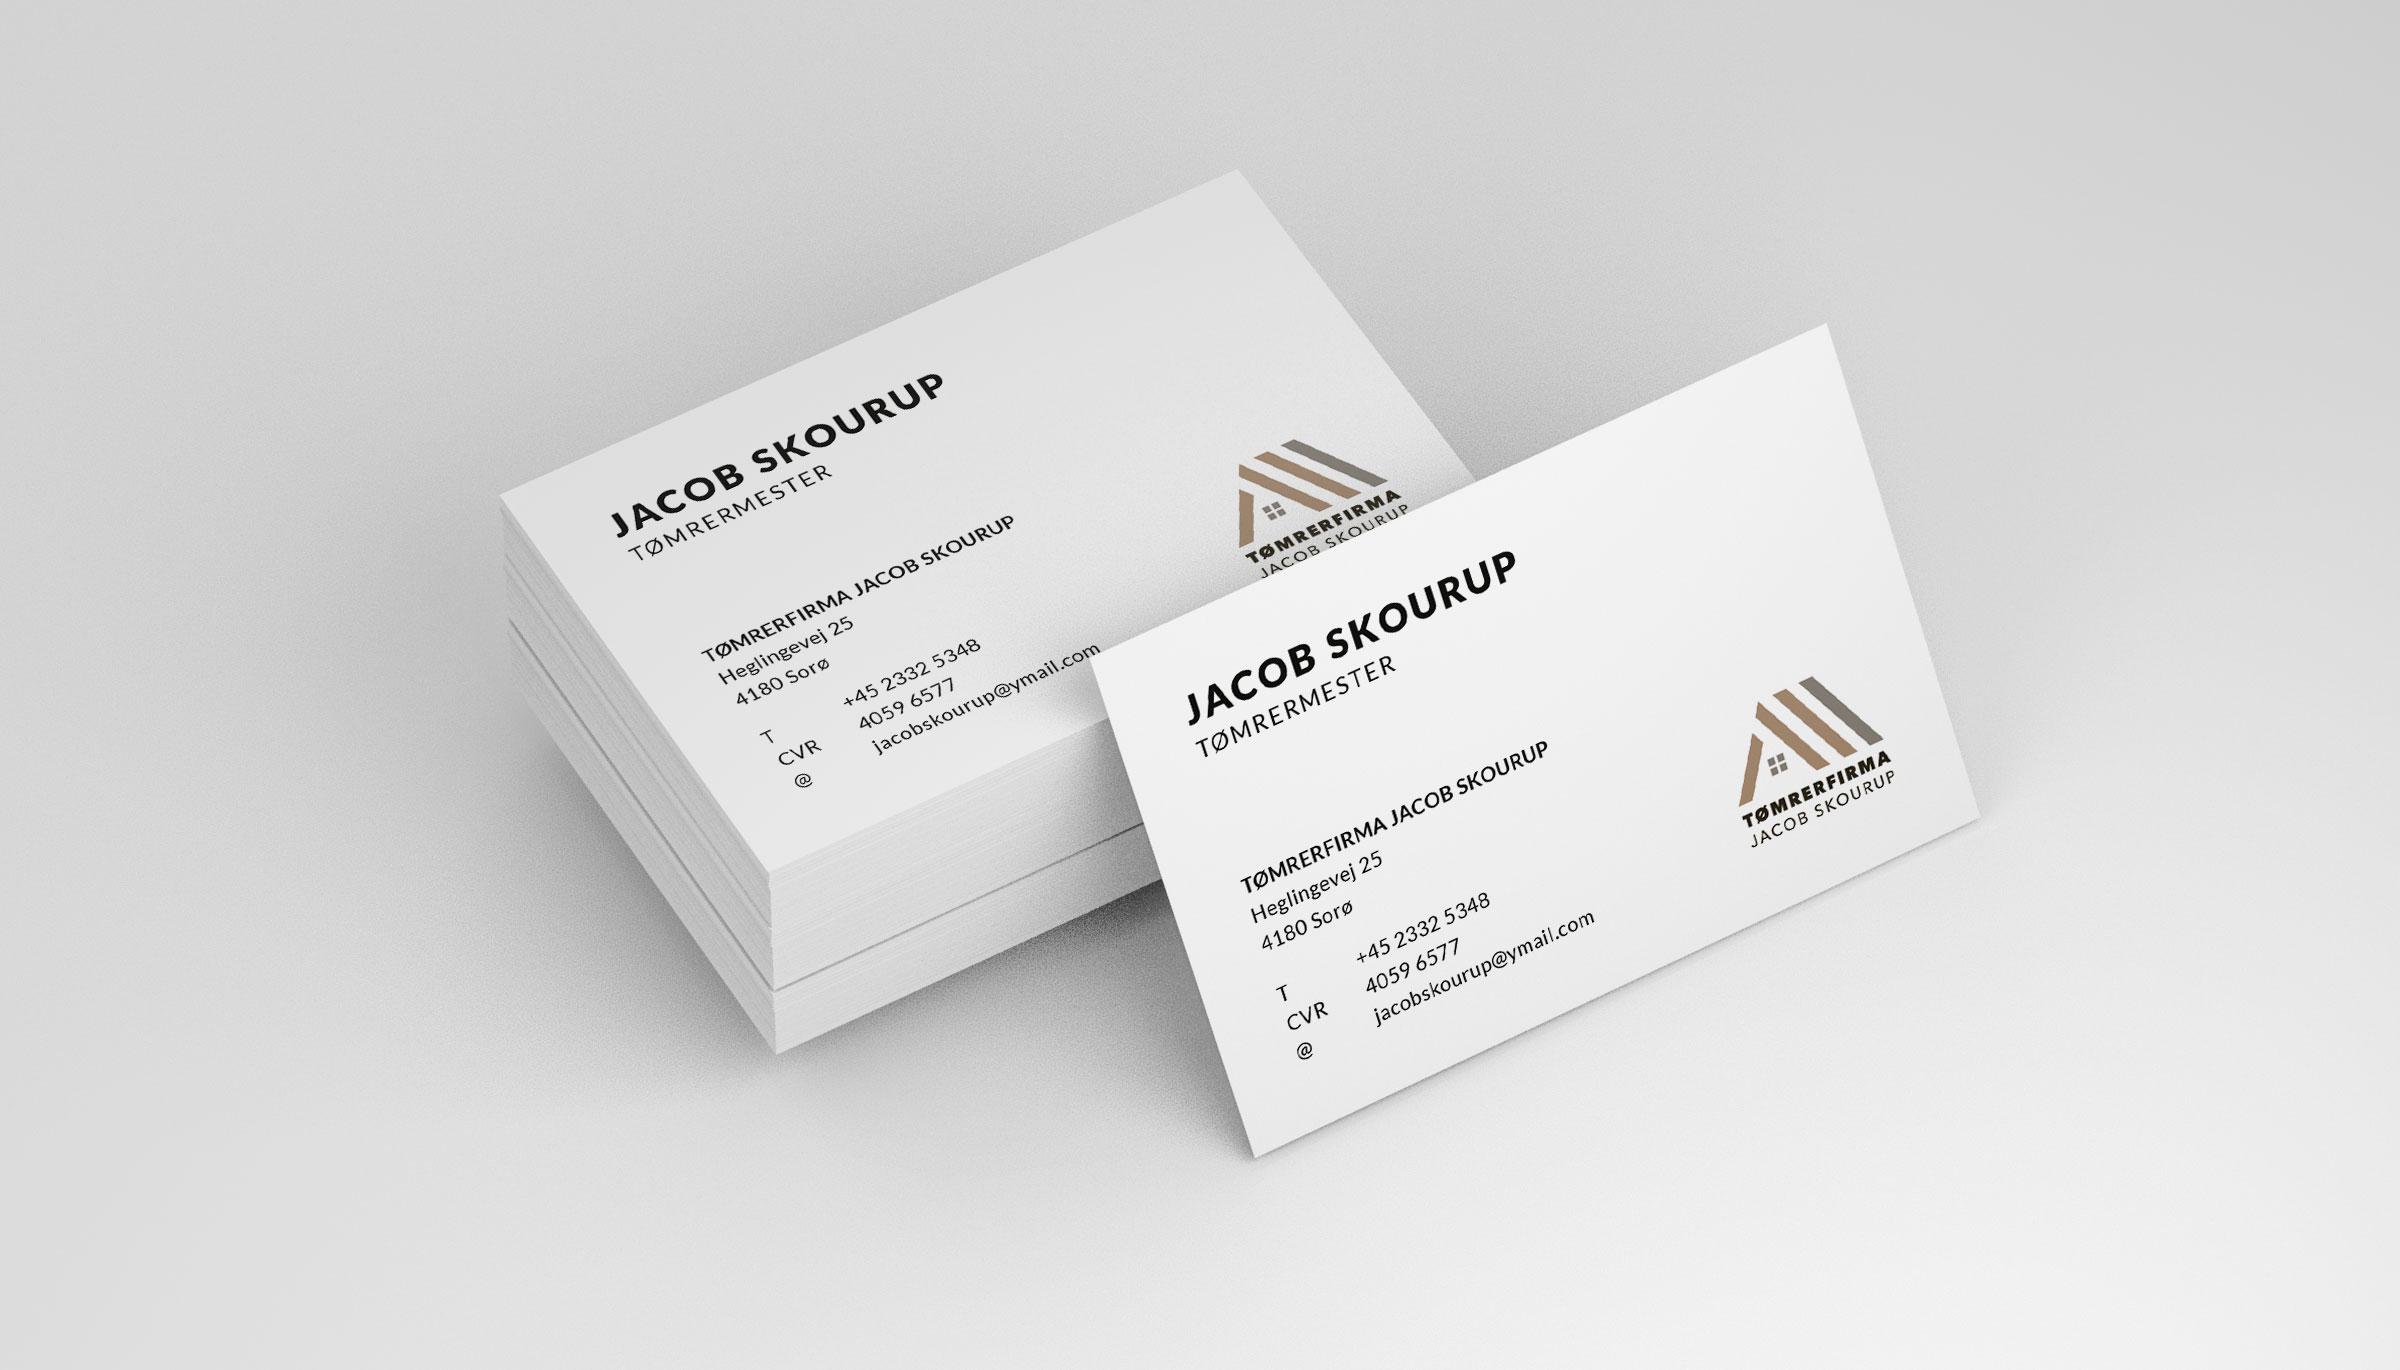 Tømrerfirmaet Jacob Skourup visitkort